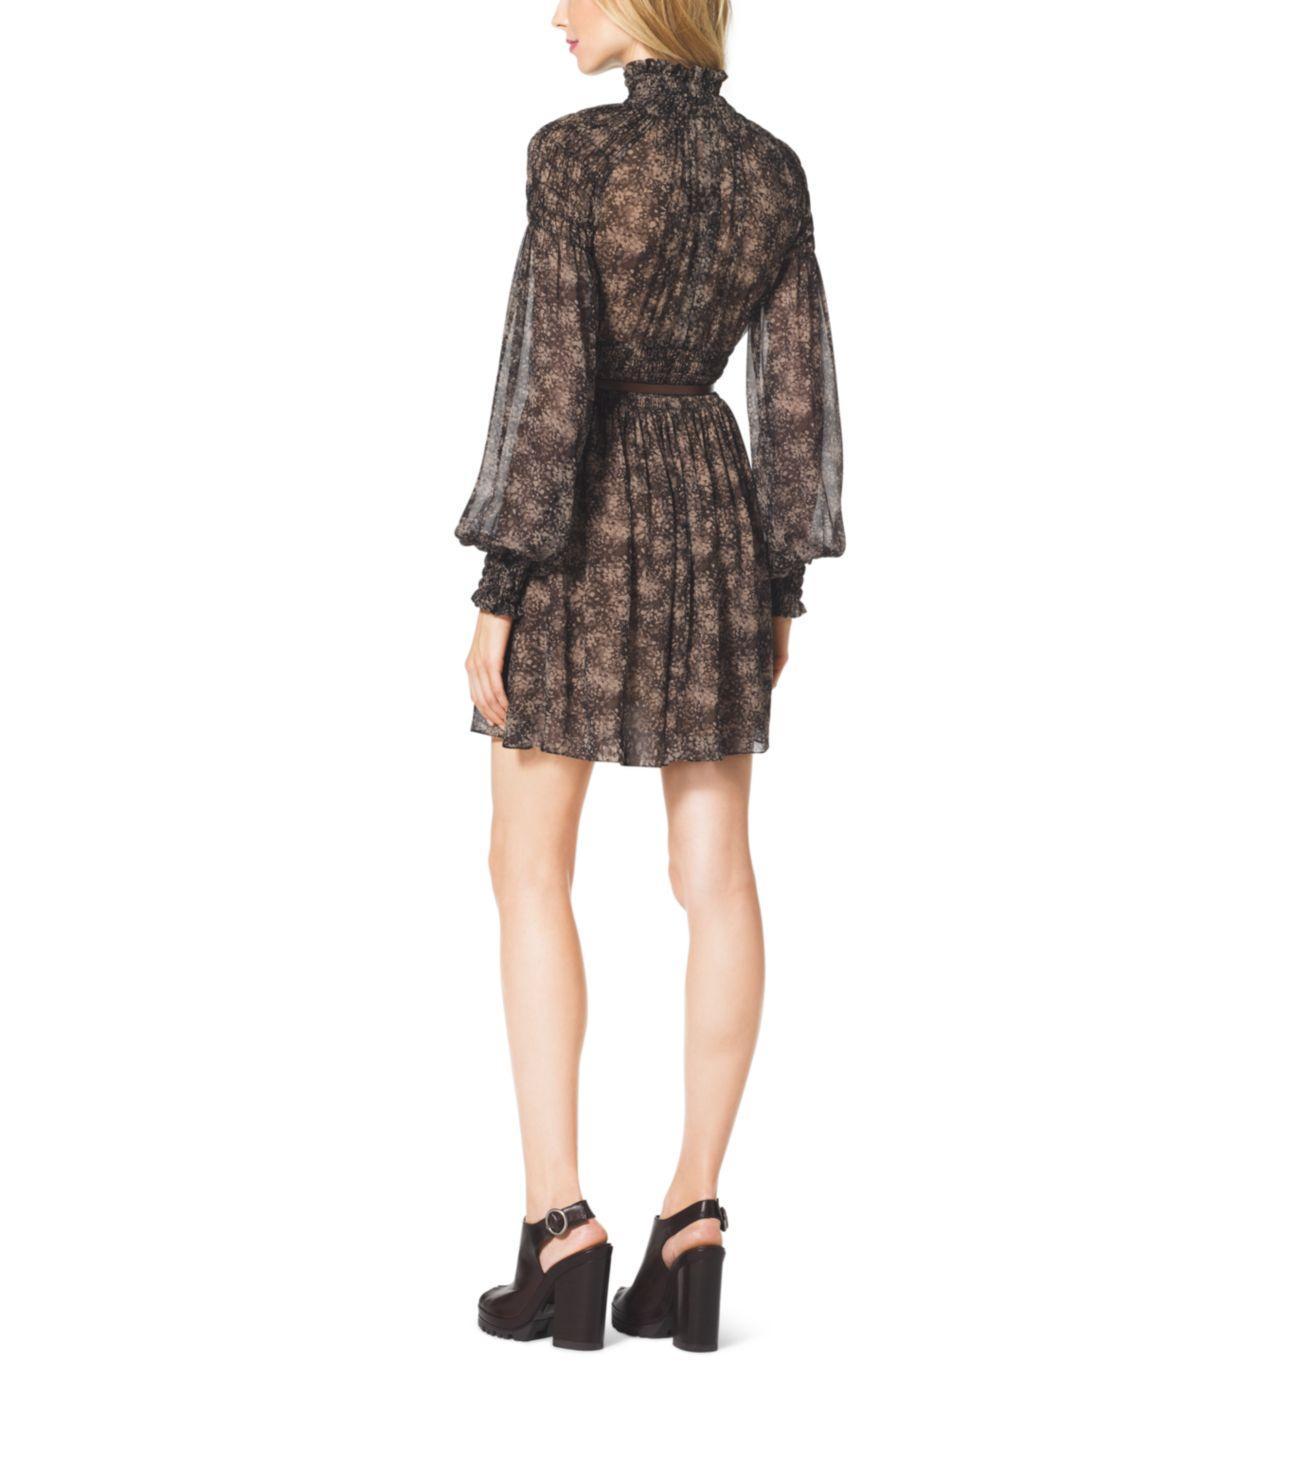 Michael Kors Bohemian-print Smocked Silk Chiffon Dress in Taupe (Brown)